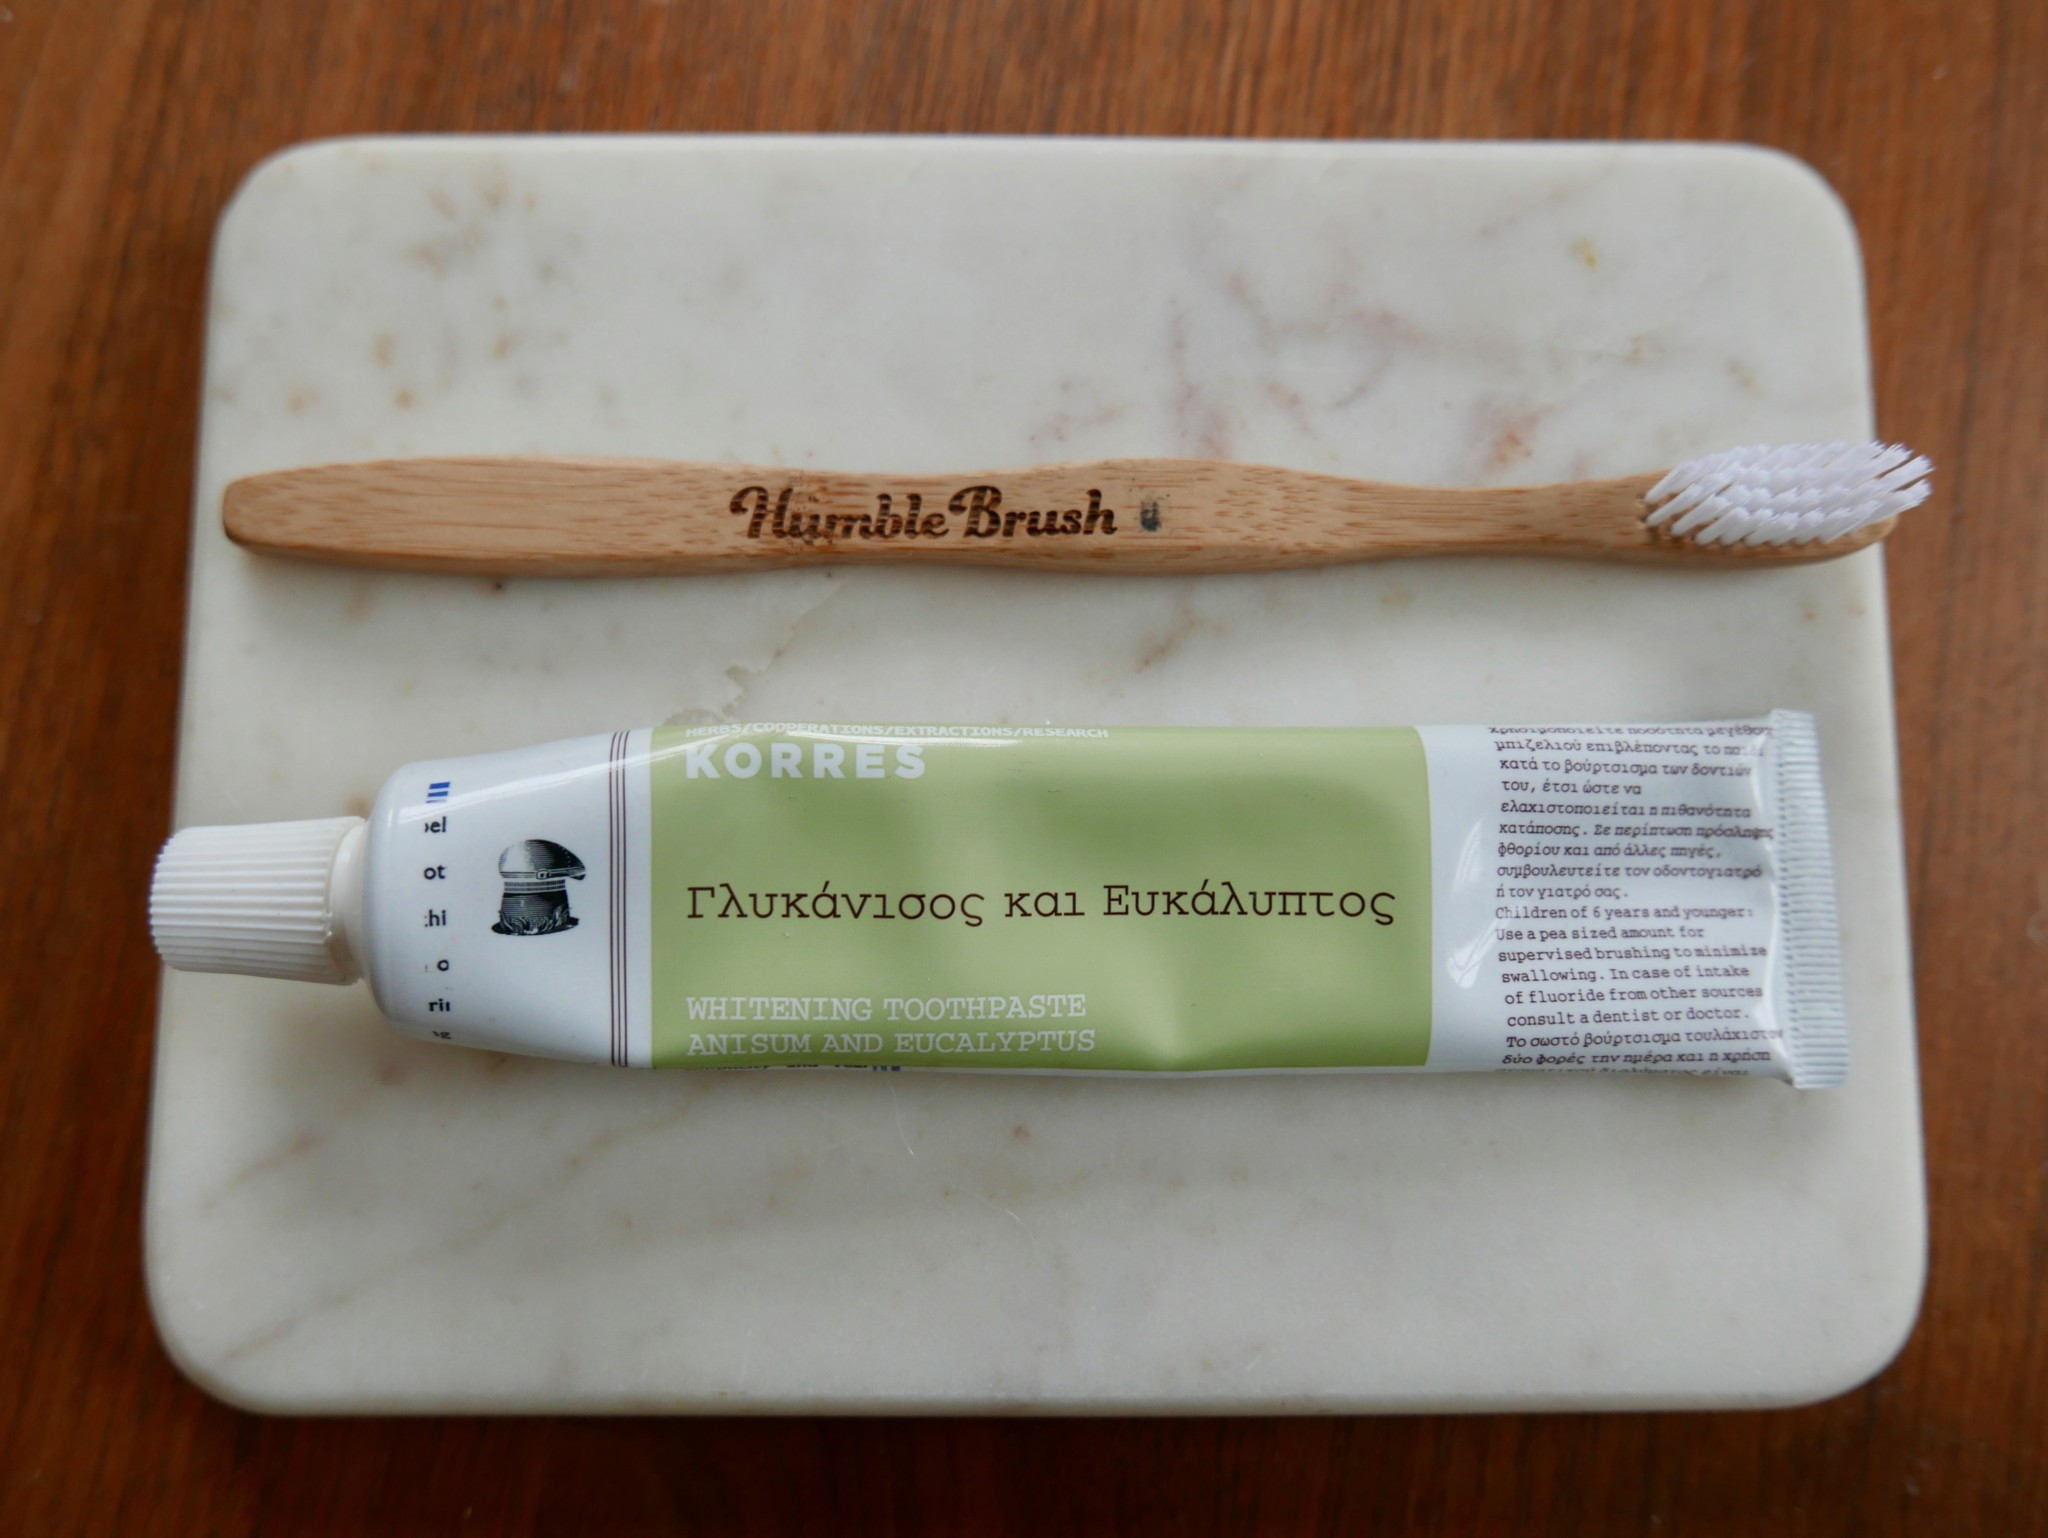 korres-toothpaste-humble-brush-anja-stang